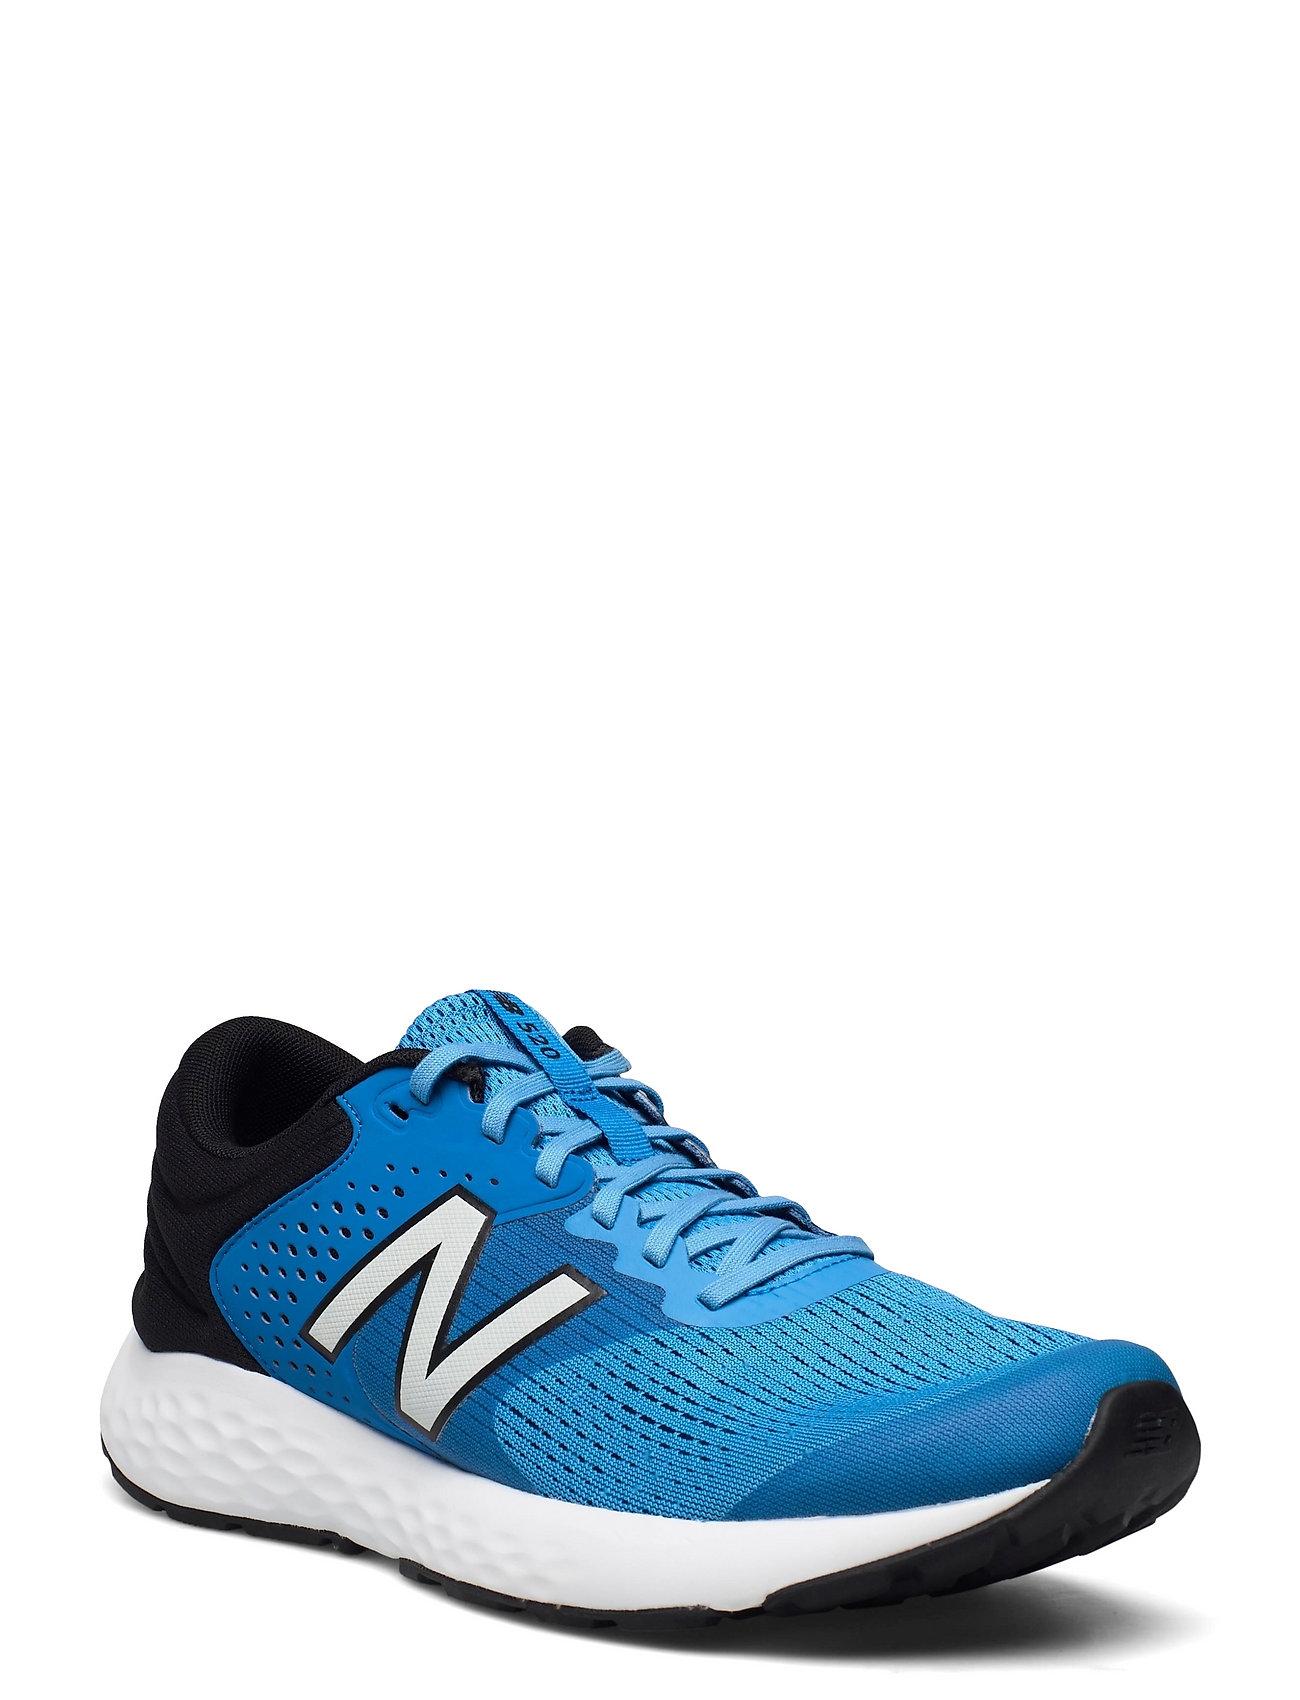 M520cl7 Shoes Sport Shoes Running Shoes Blå New Balance